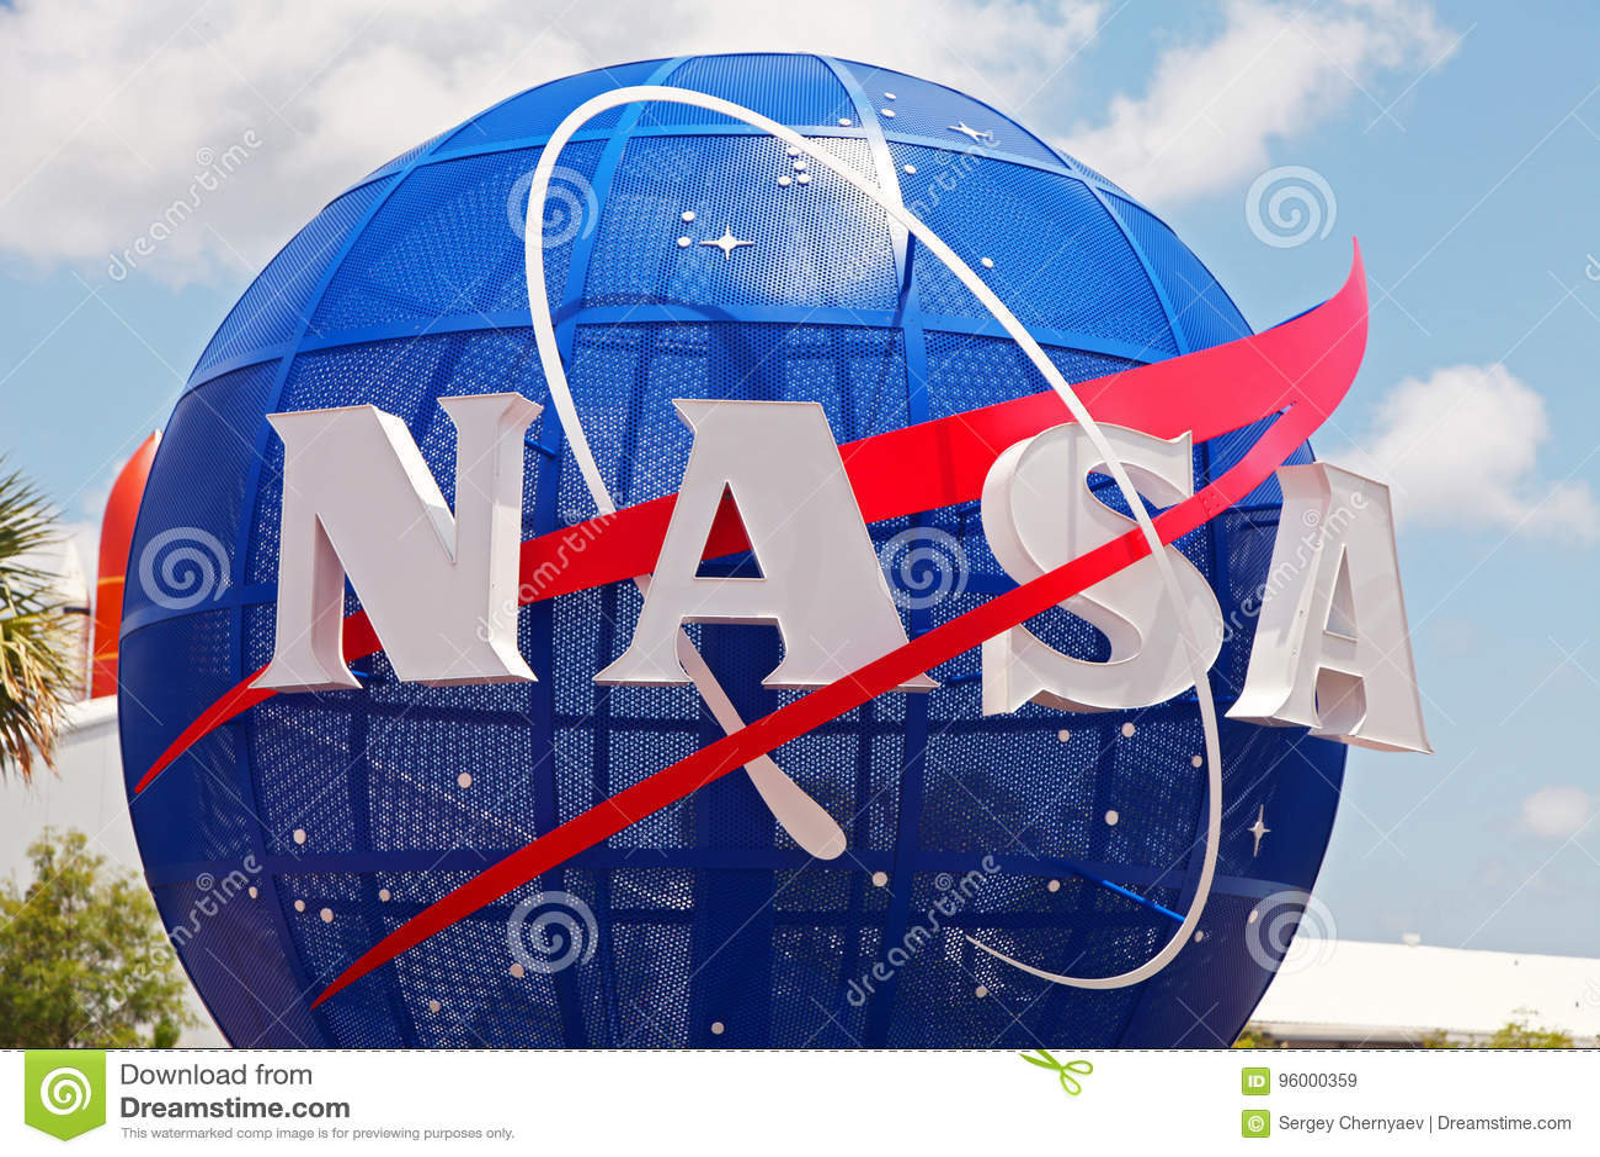 Kennedy Space Center Cape Canaveral, Florida, USA